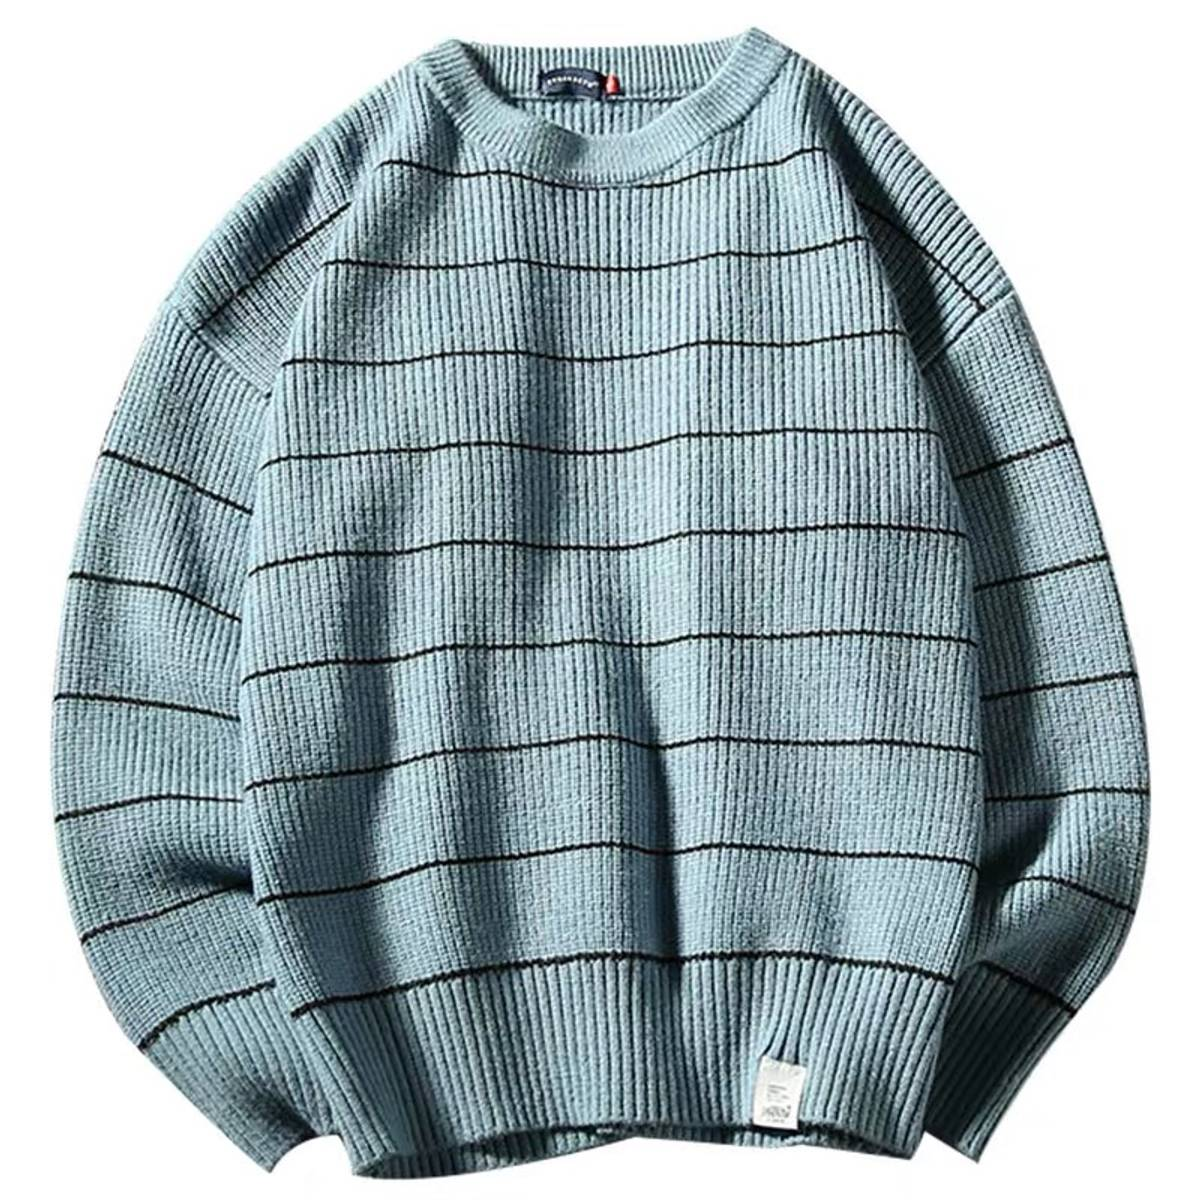 Custom 2019 AW Simple Blue Japan Blue Striped Sweater Size M $85